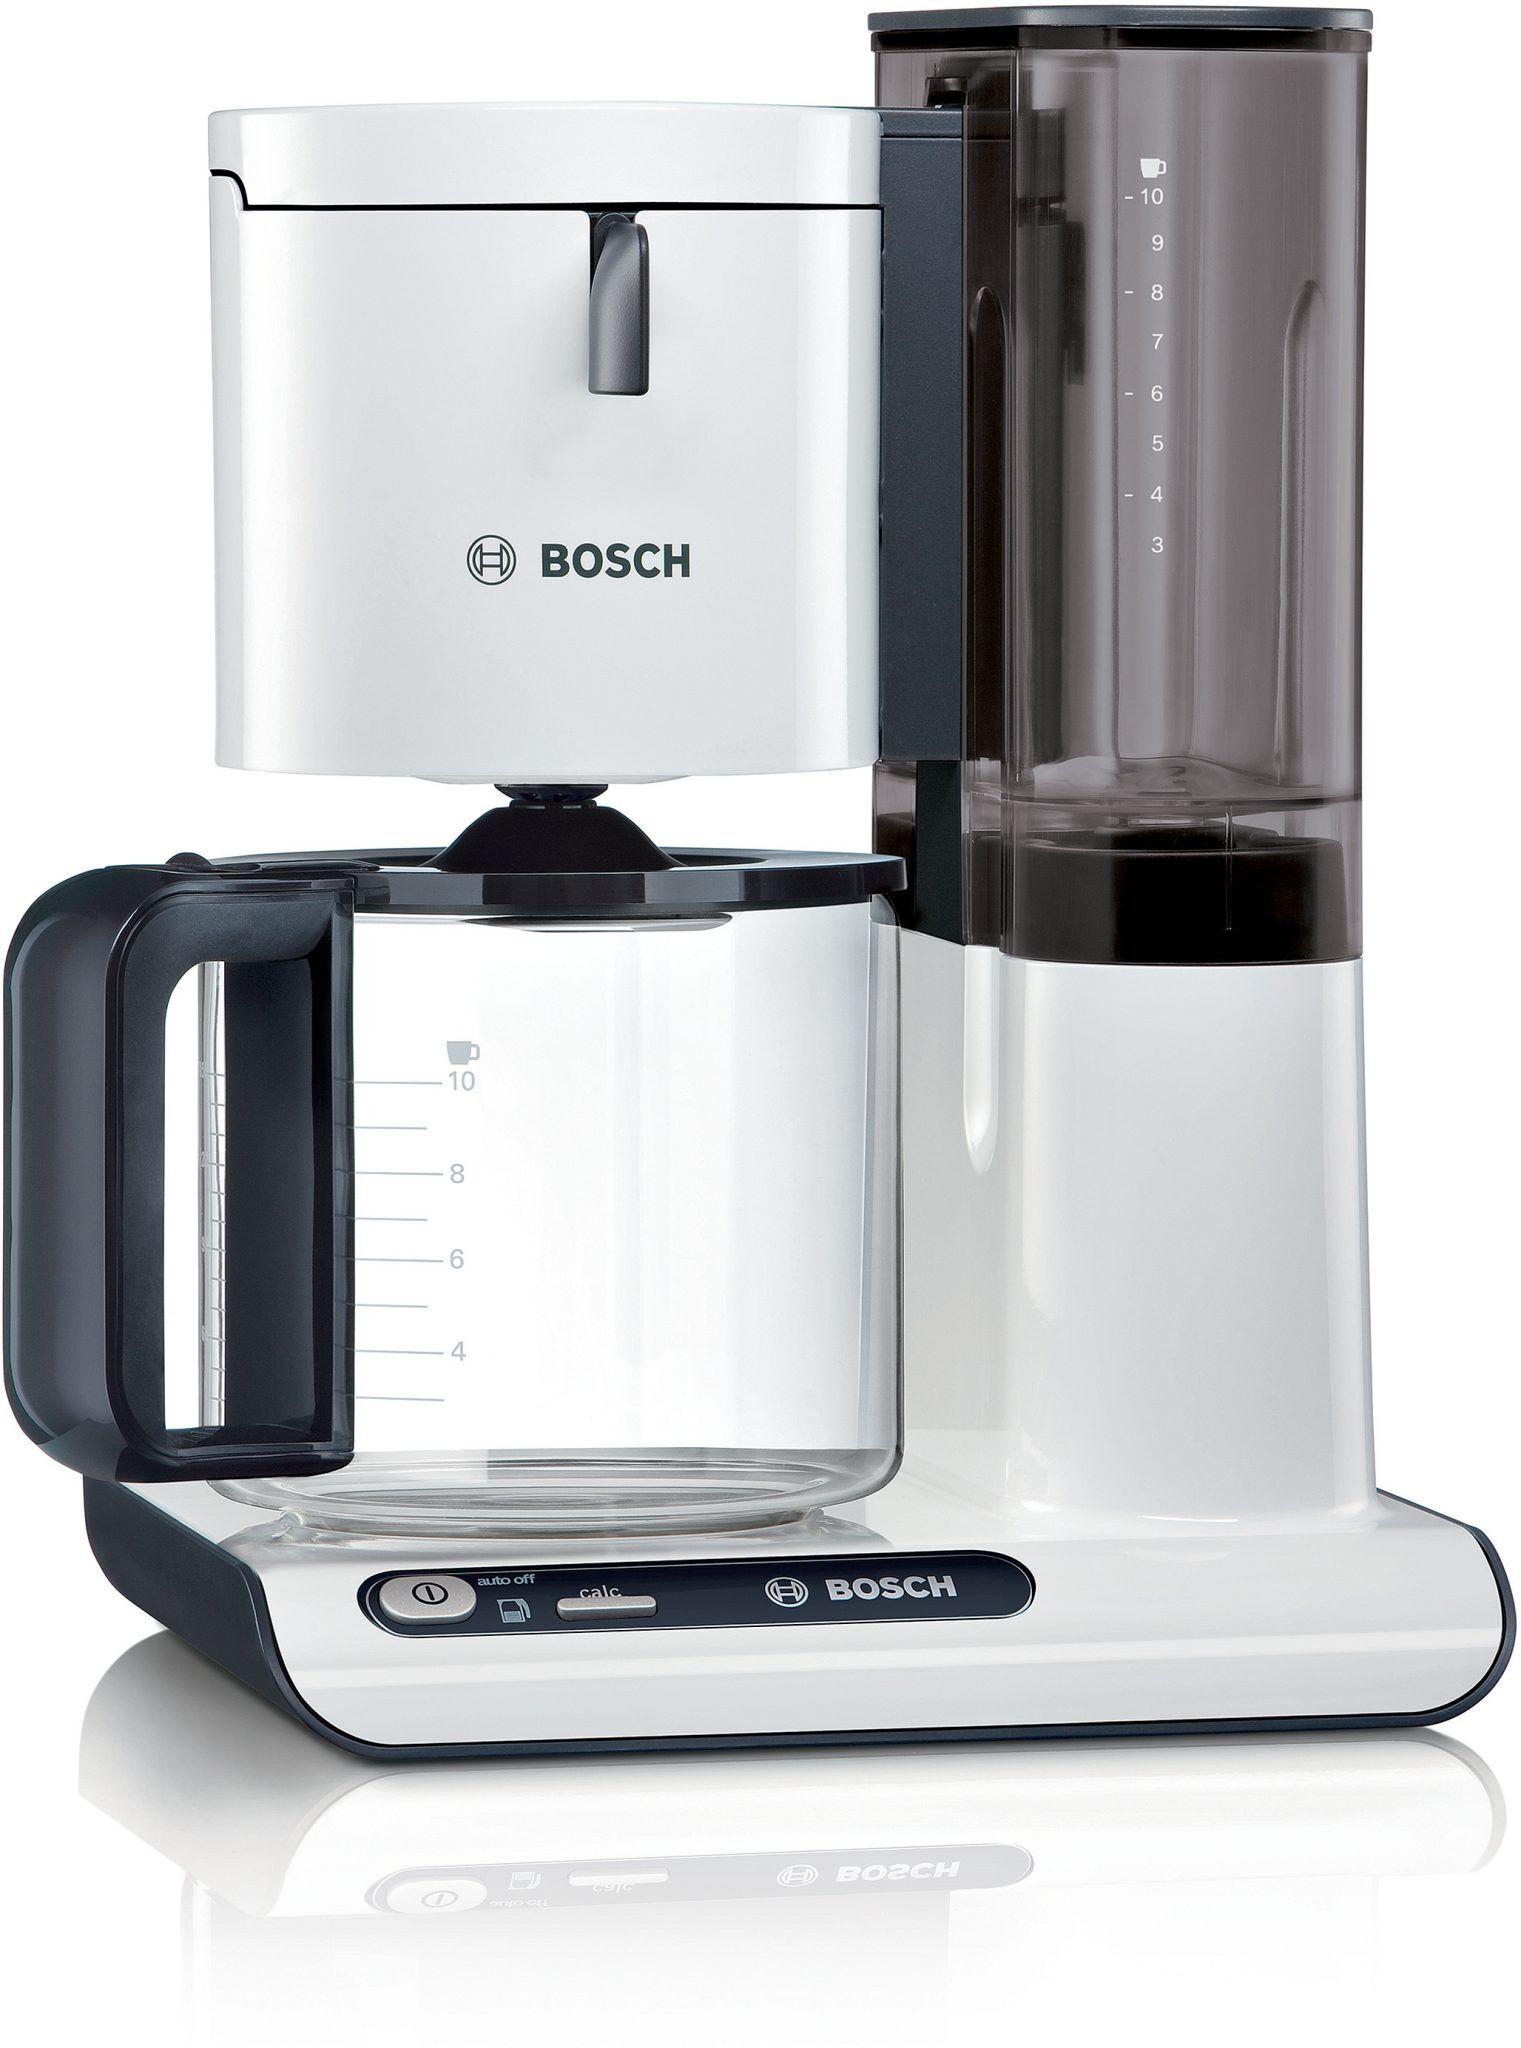 Bosch TKA8011 Drip Filter Coffee Machine